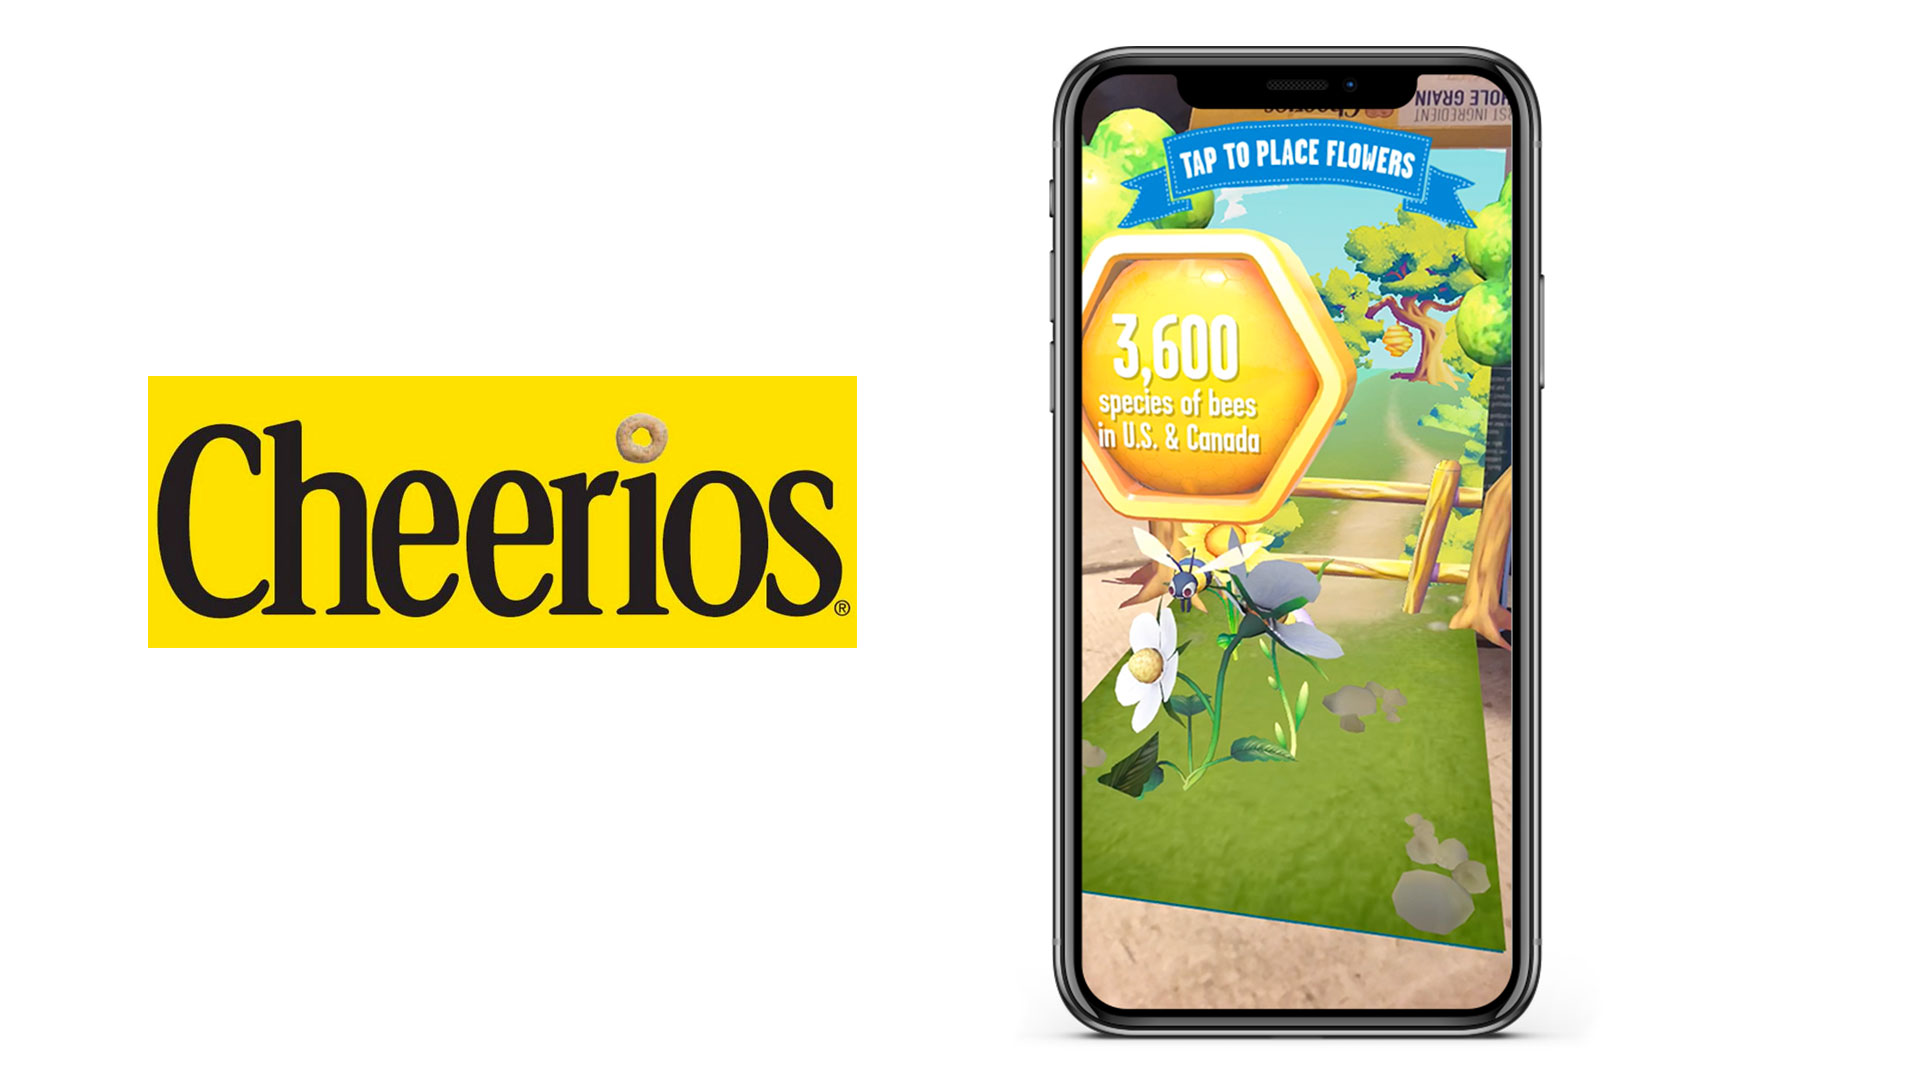 Cheerios Augmented reality